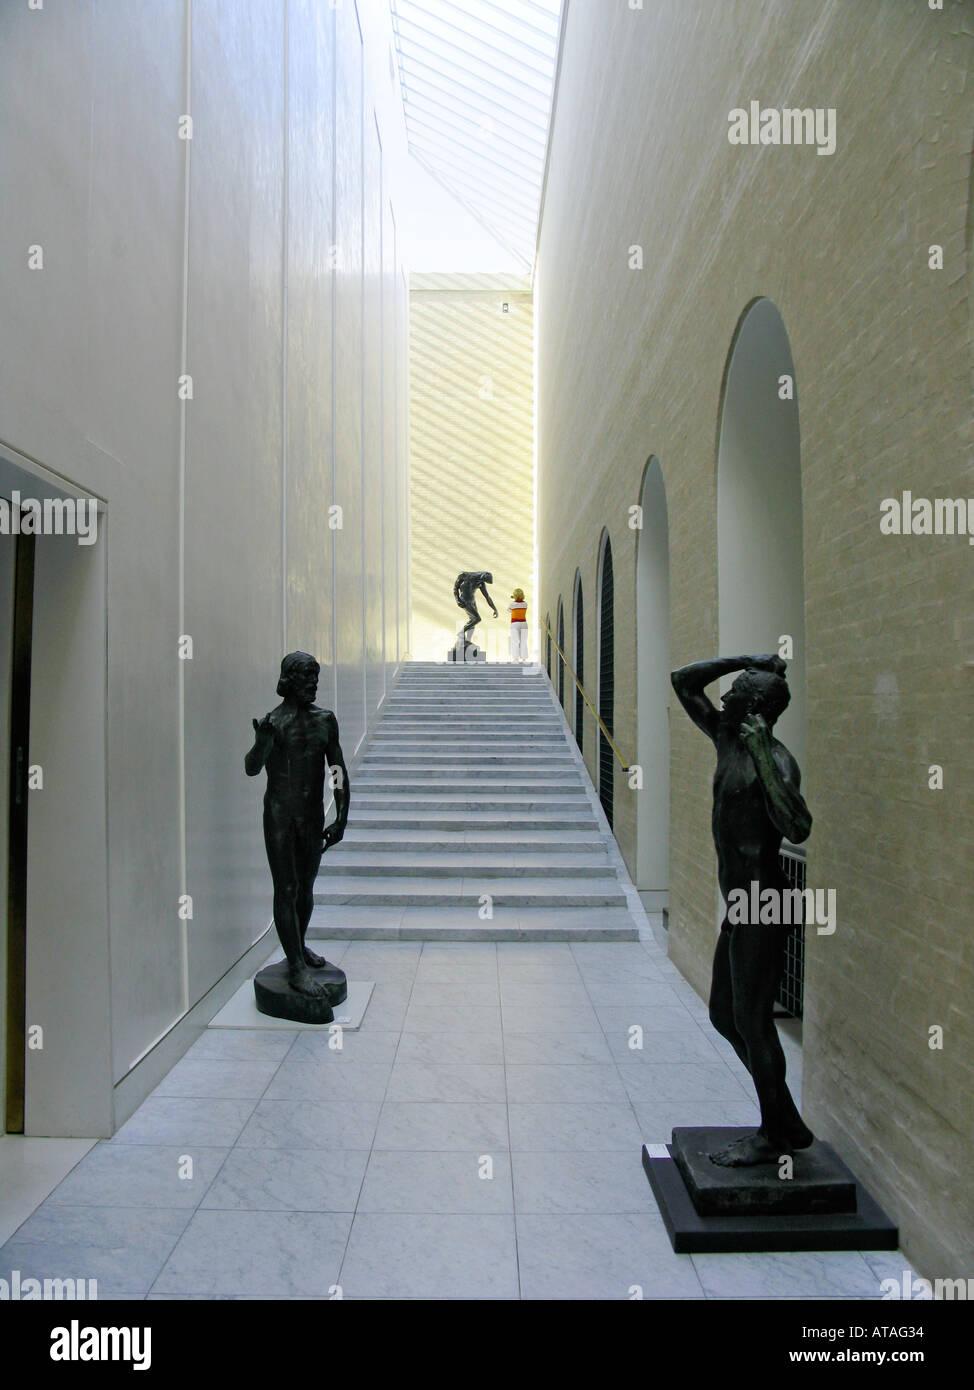 Copenhagen Denmark Interior Ny Carlsberg Glyptotek - Stock Image